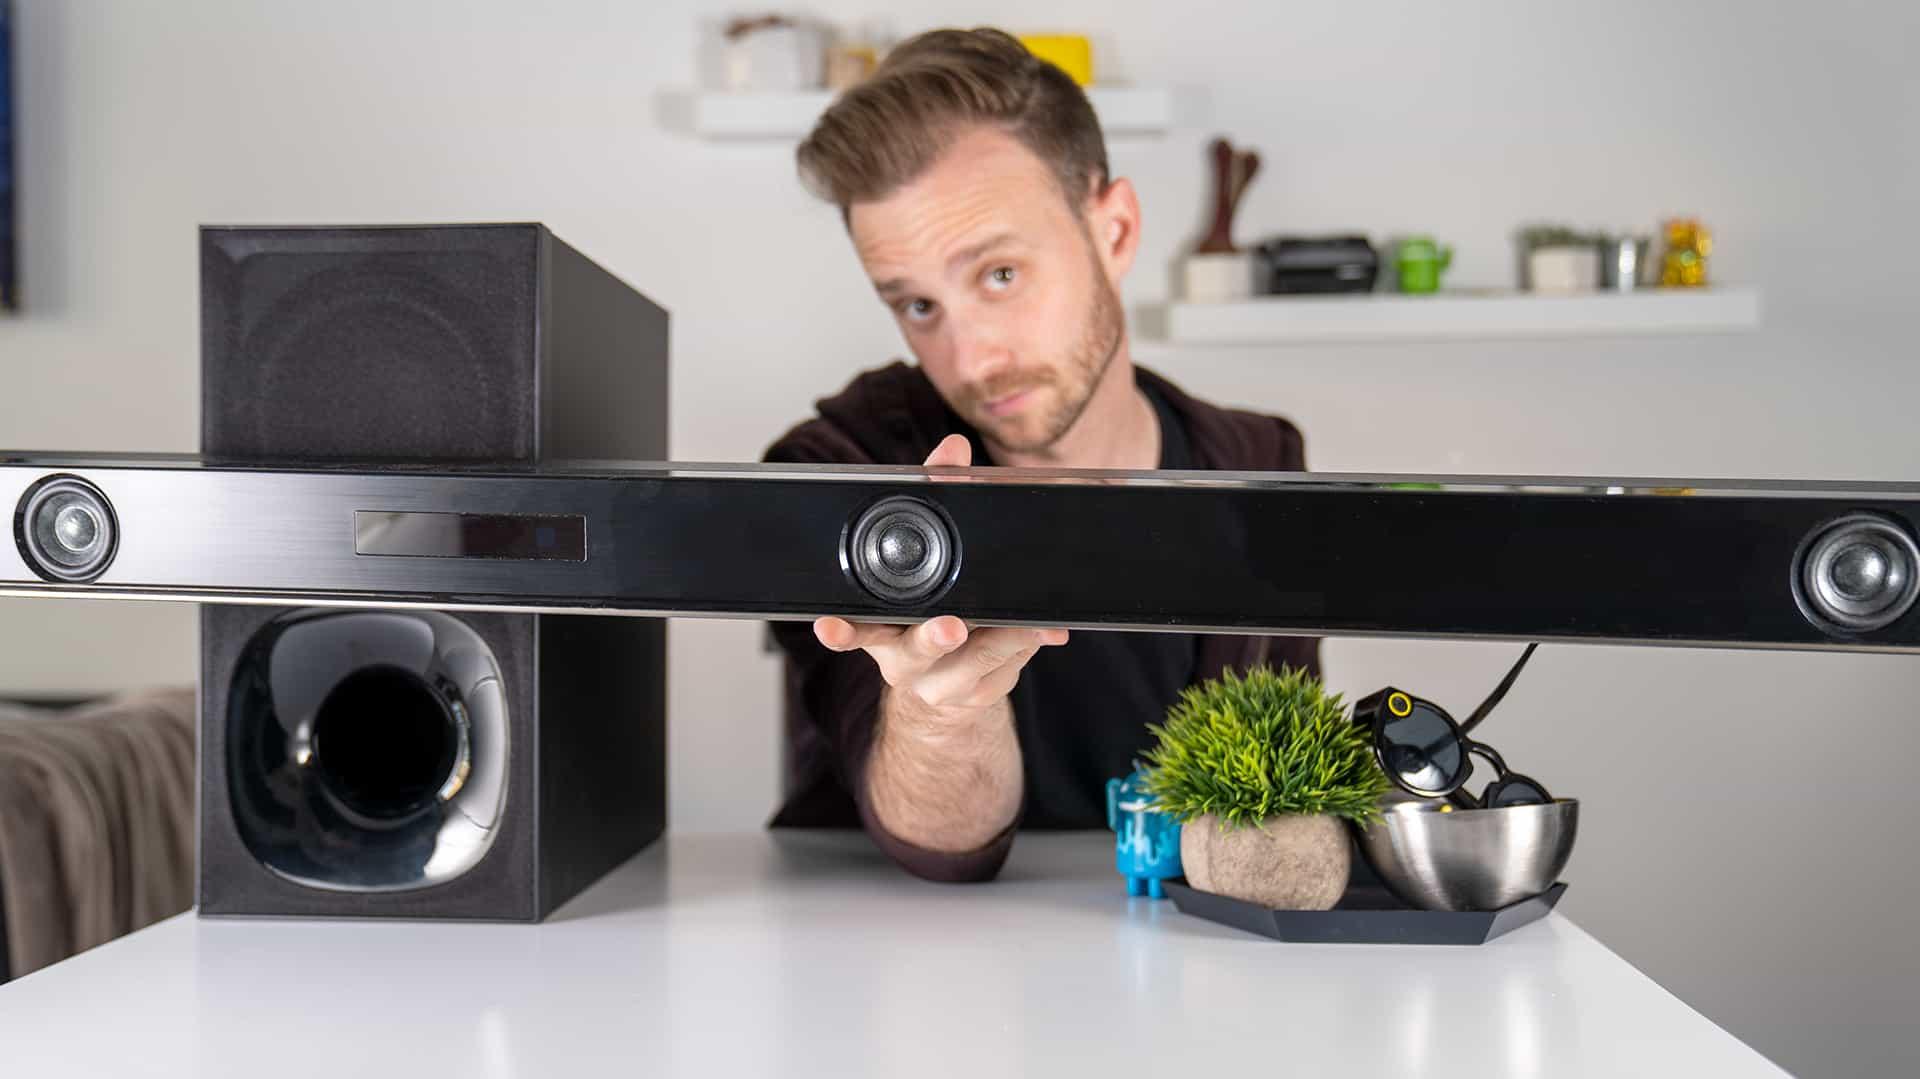 Sony Ht Z9f Soundbar Complete Walkthrough Closest To